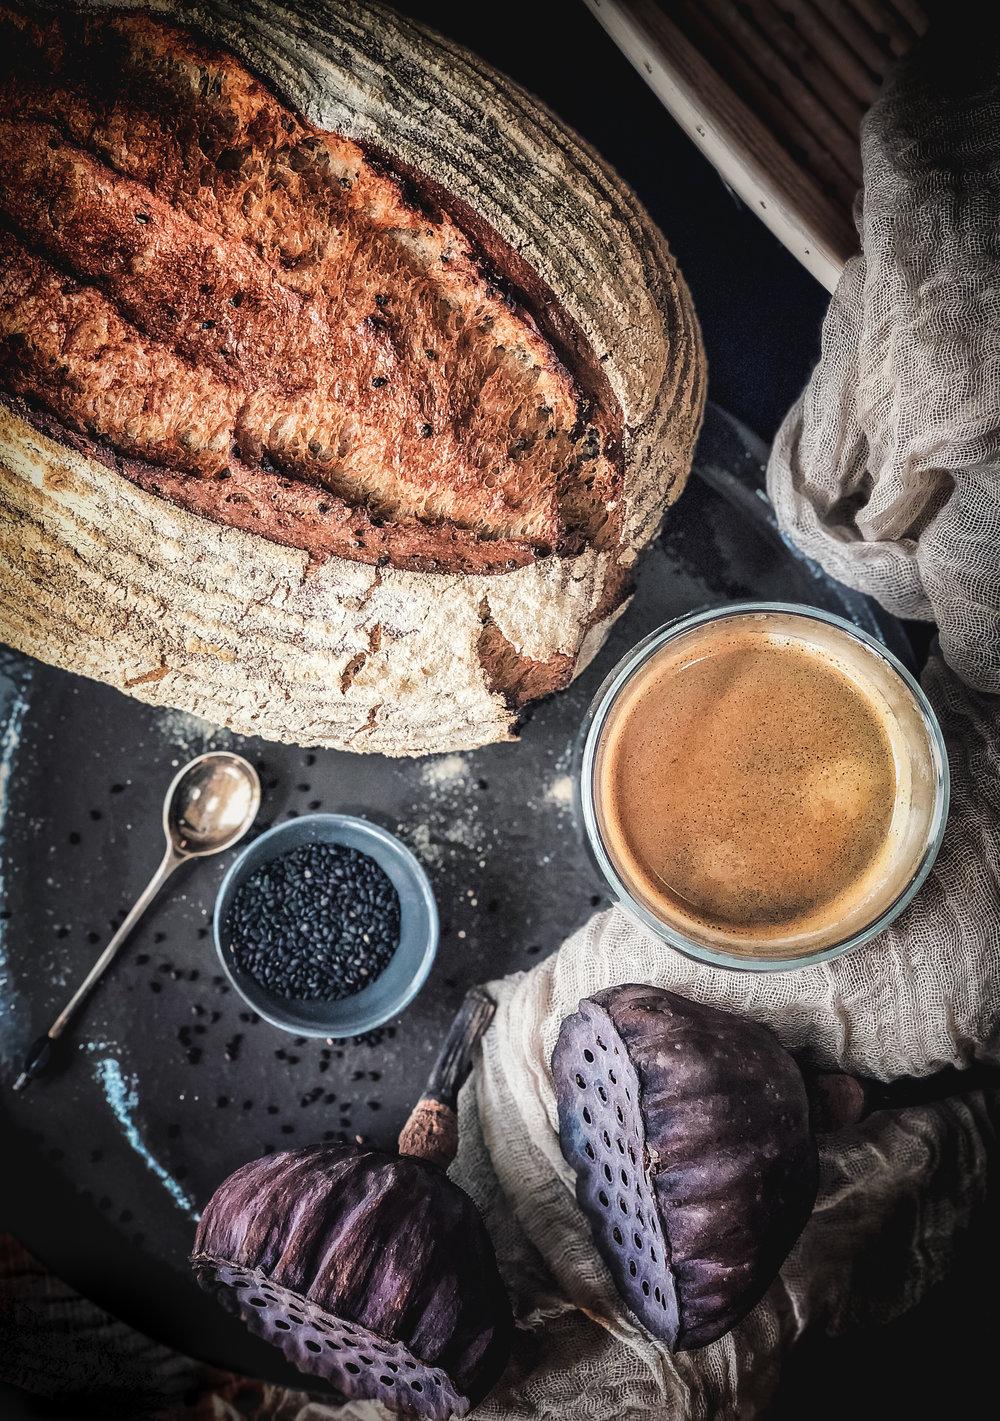 Black sesame khorasan bread